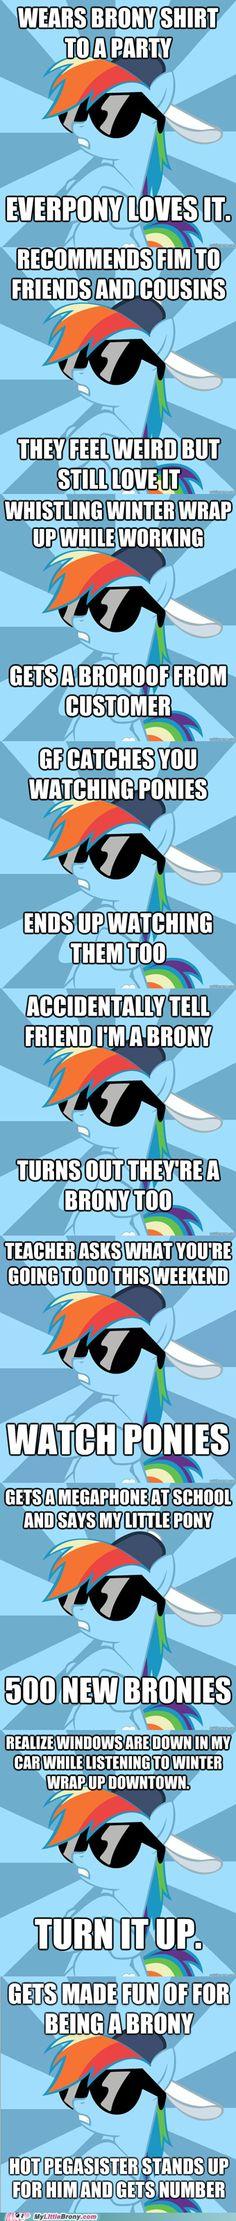 Socially Awesome Brony- Rainbowdash OHMAHGAWD THIS IS AMAZAYN!! haha hot pegasister